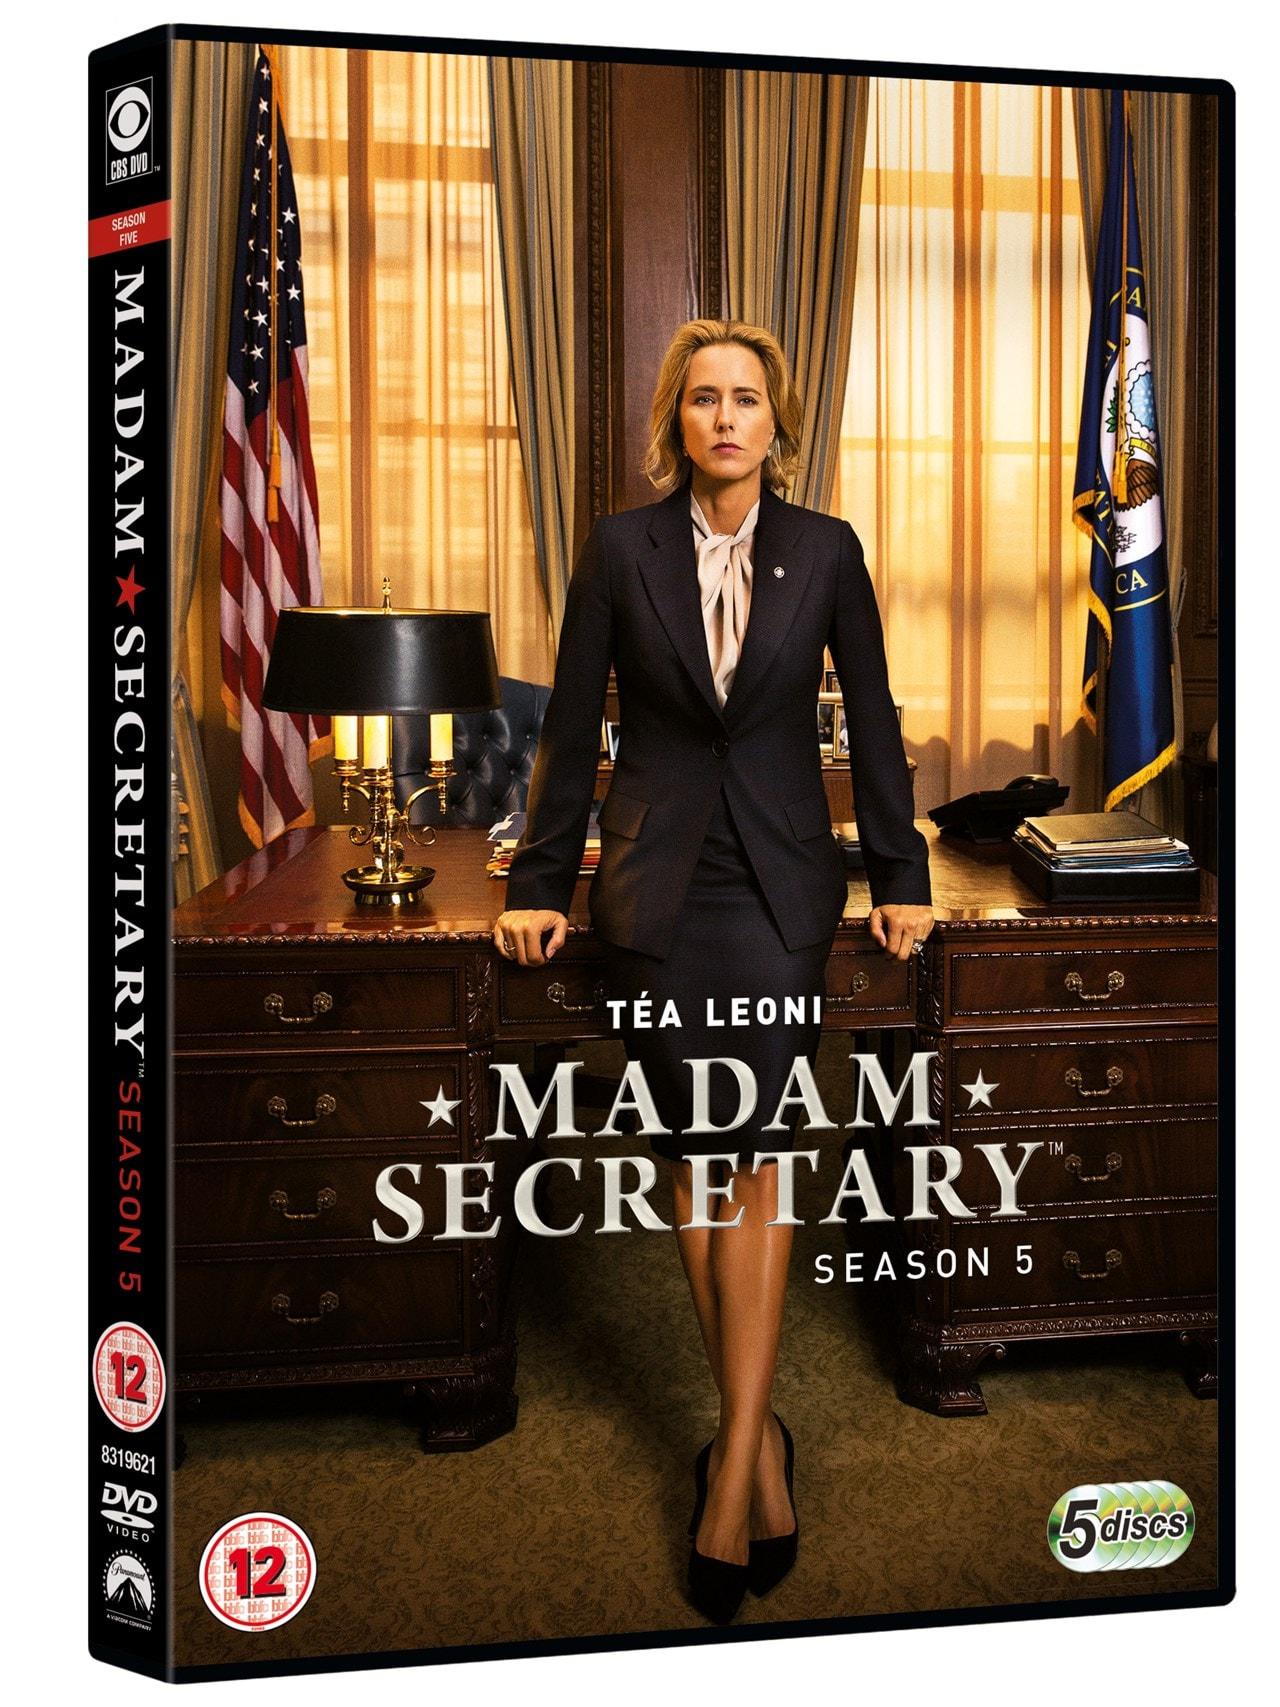 Madam Secretary: Season 5 - 2